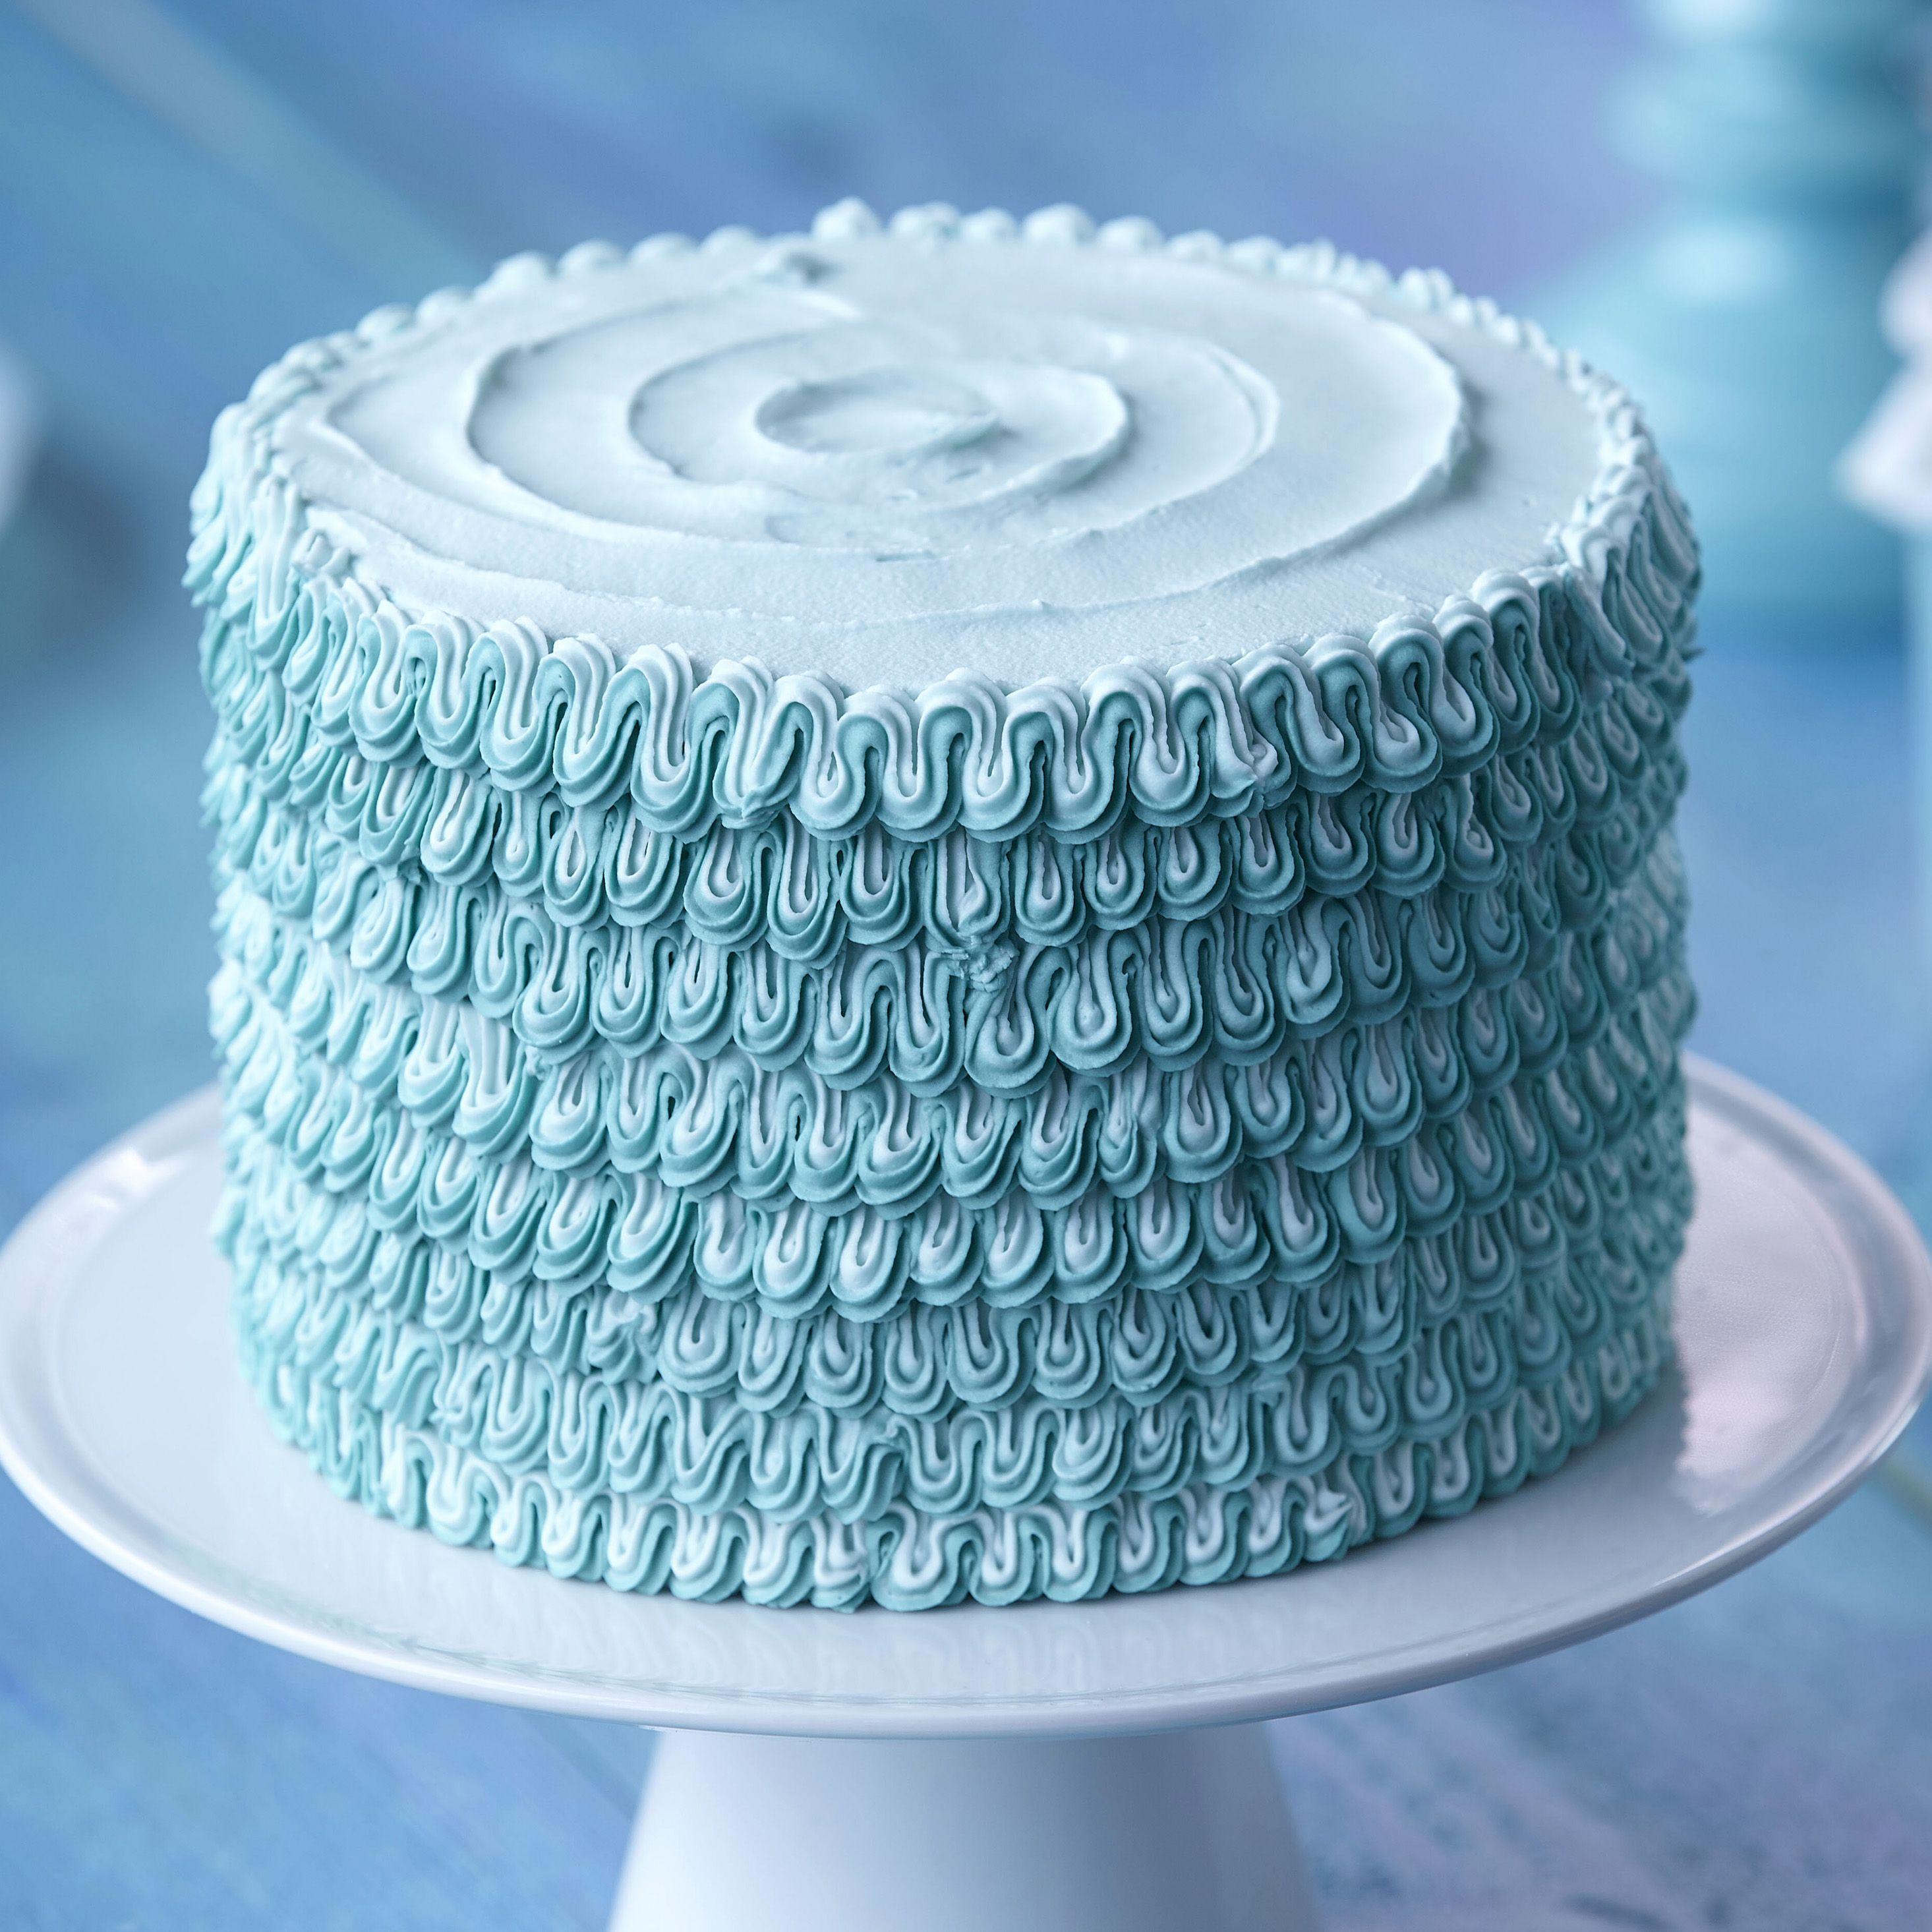 Basic Cake Designs